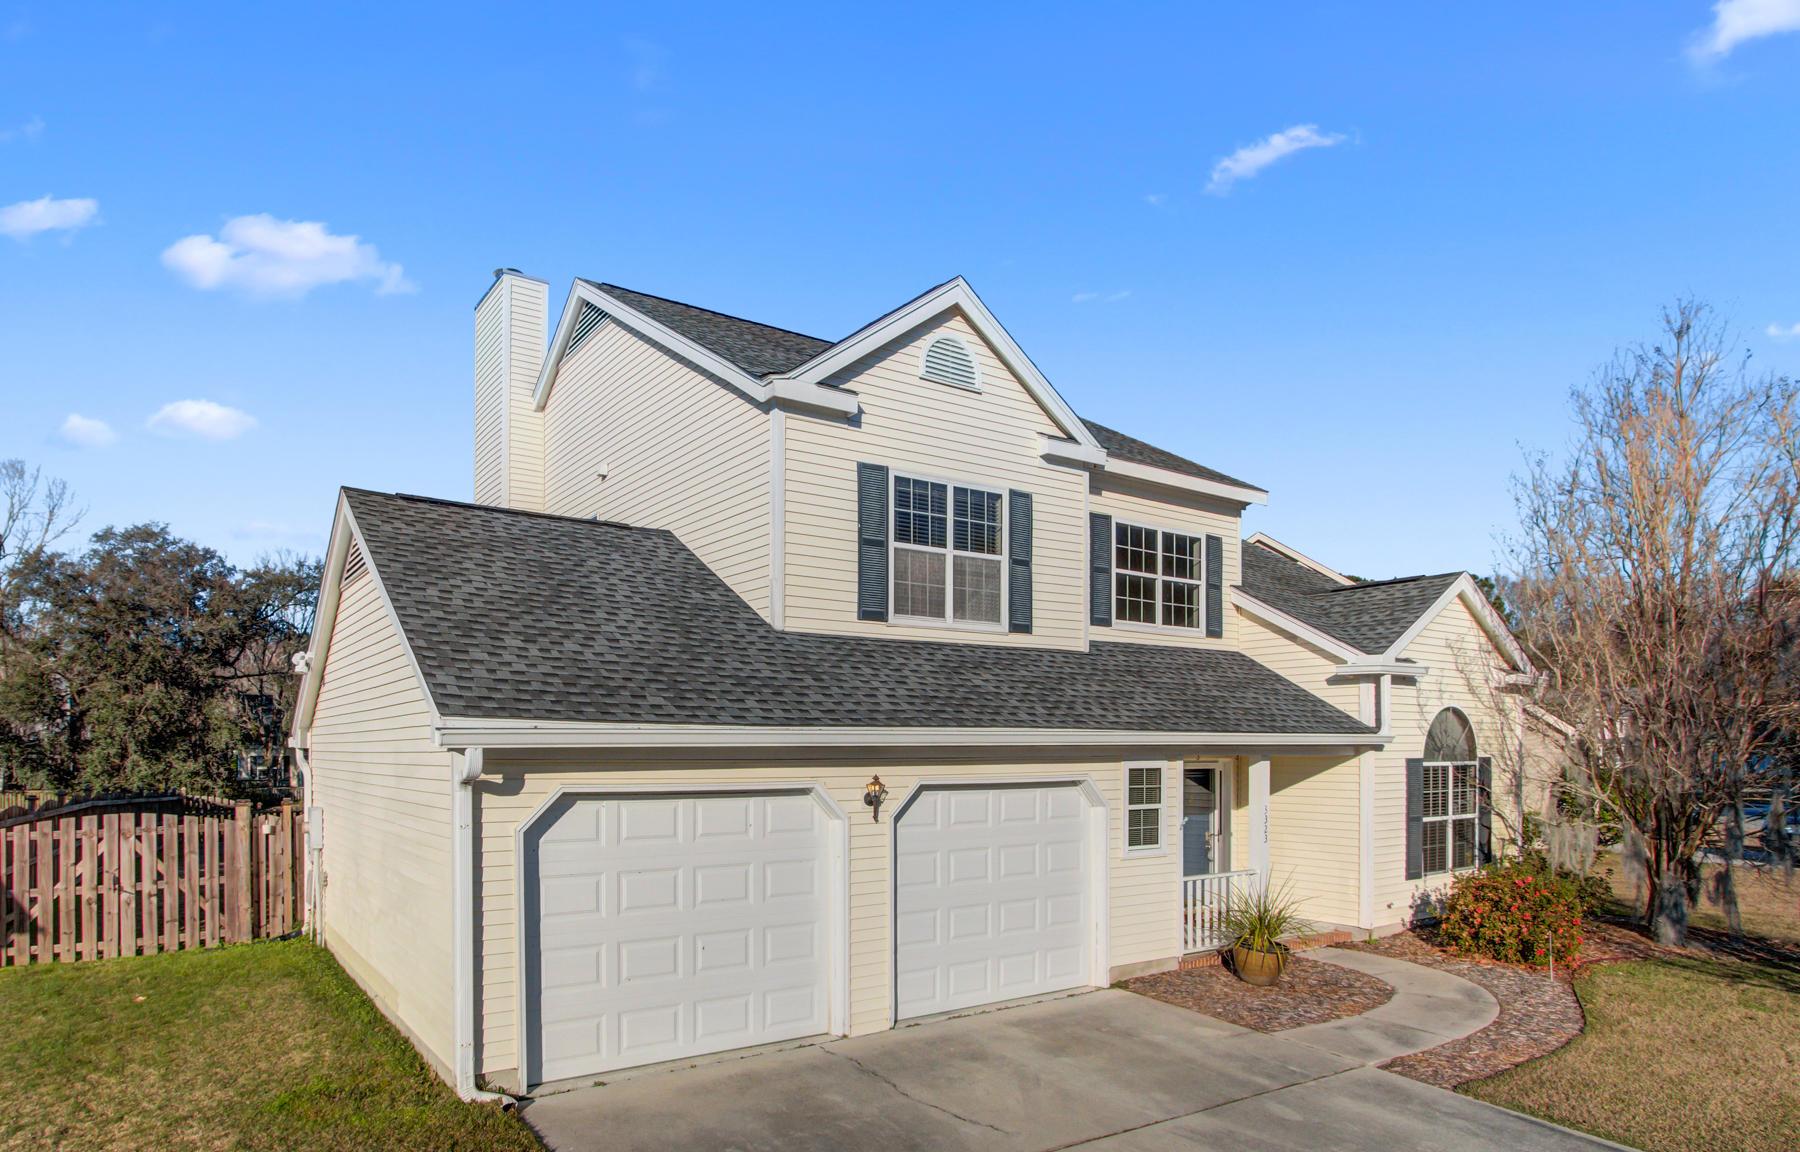 Village Green Homes For Sale - 3323 Hearthside, Charleston, SC - 13